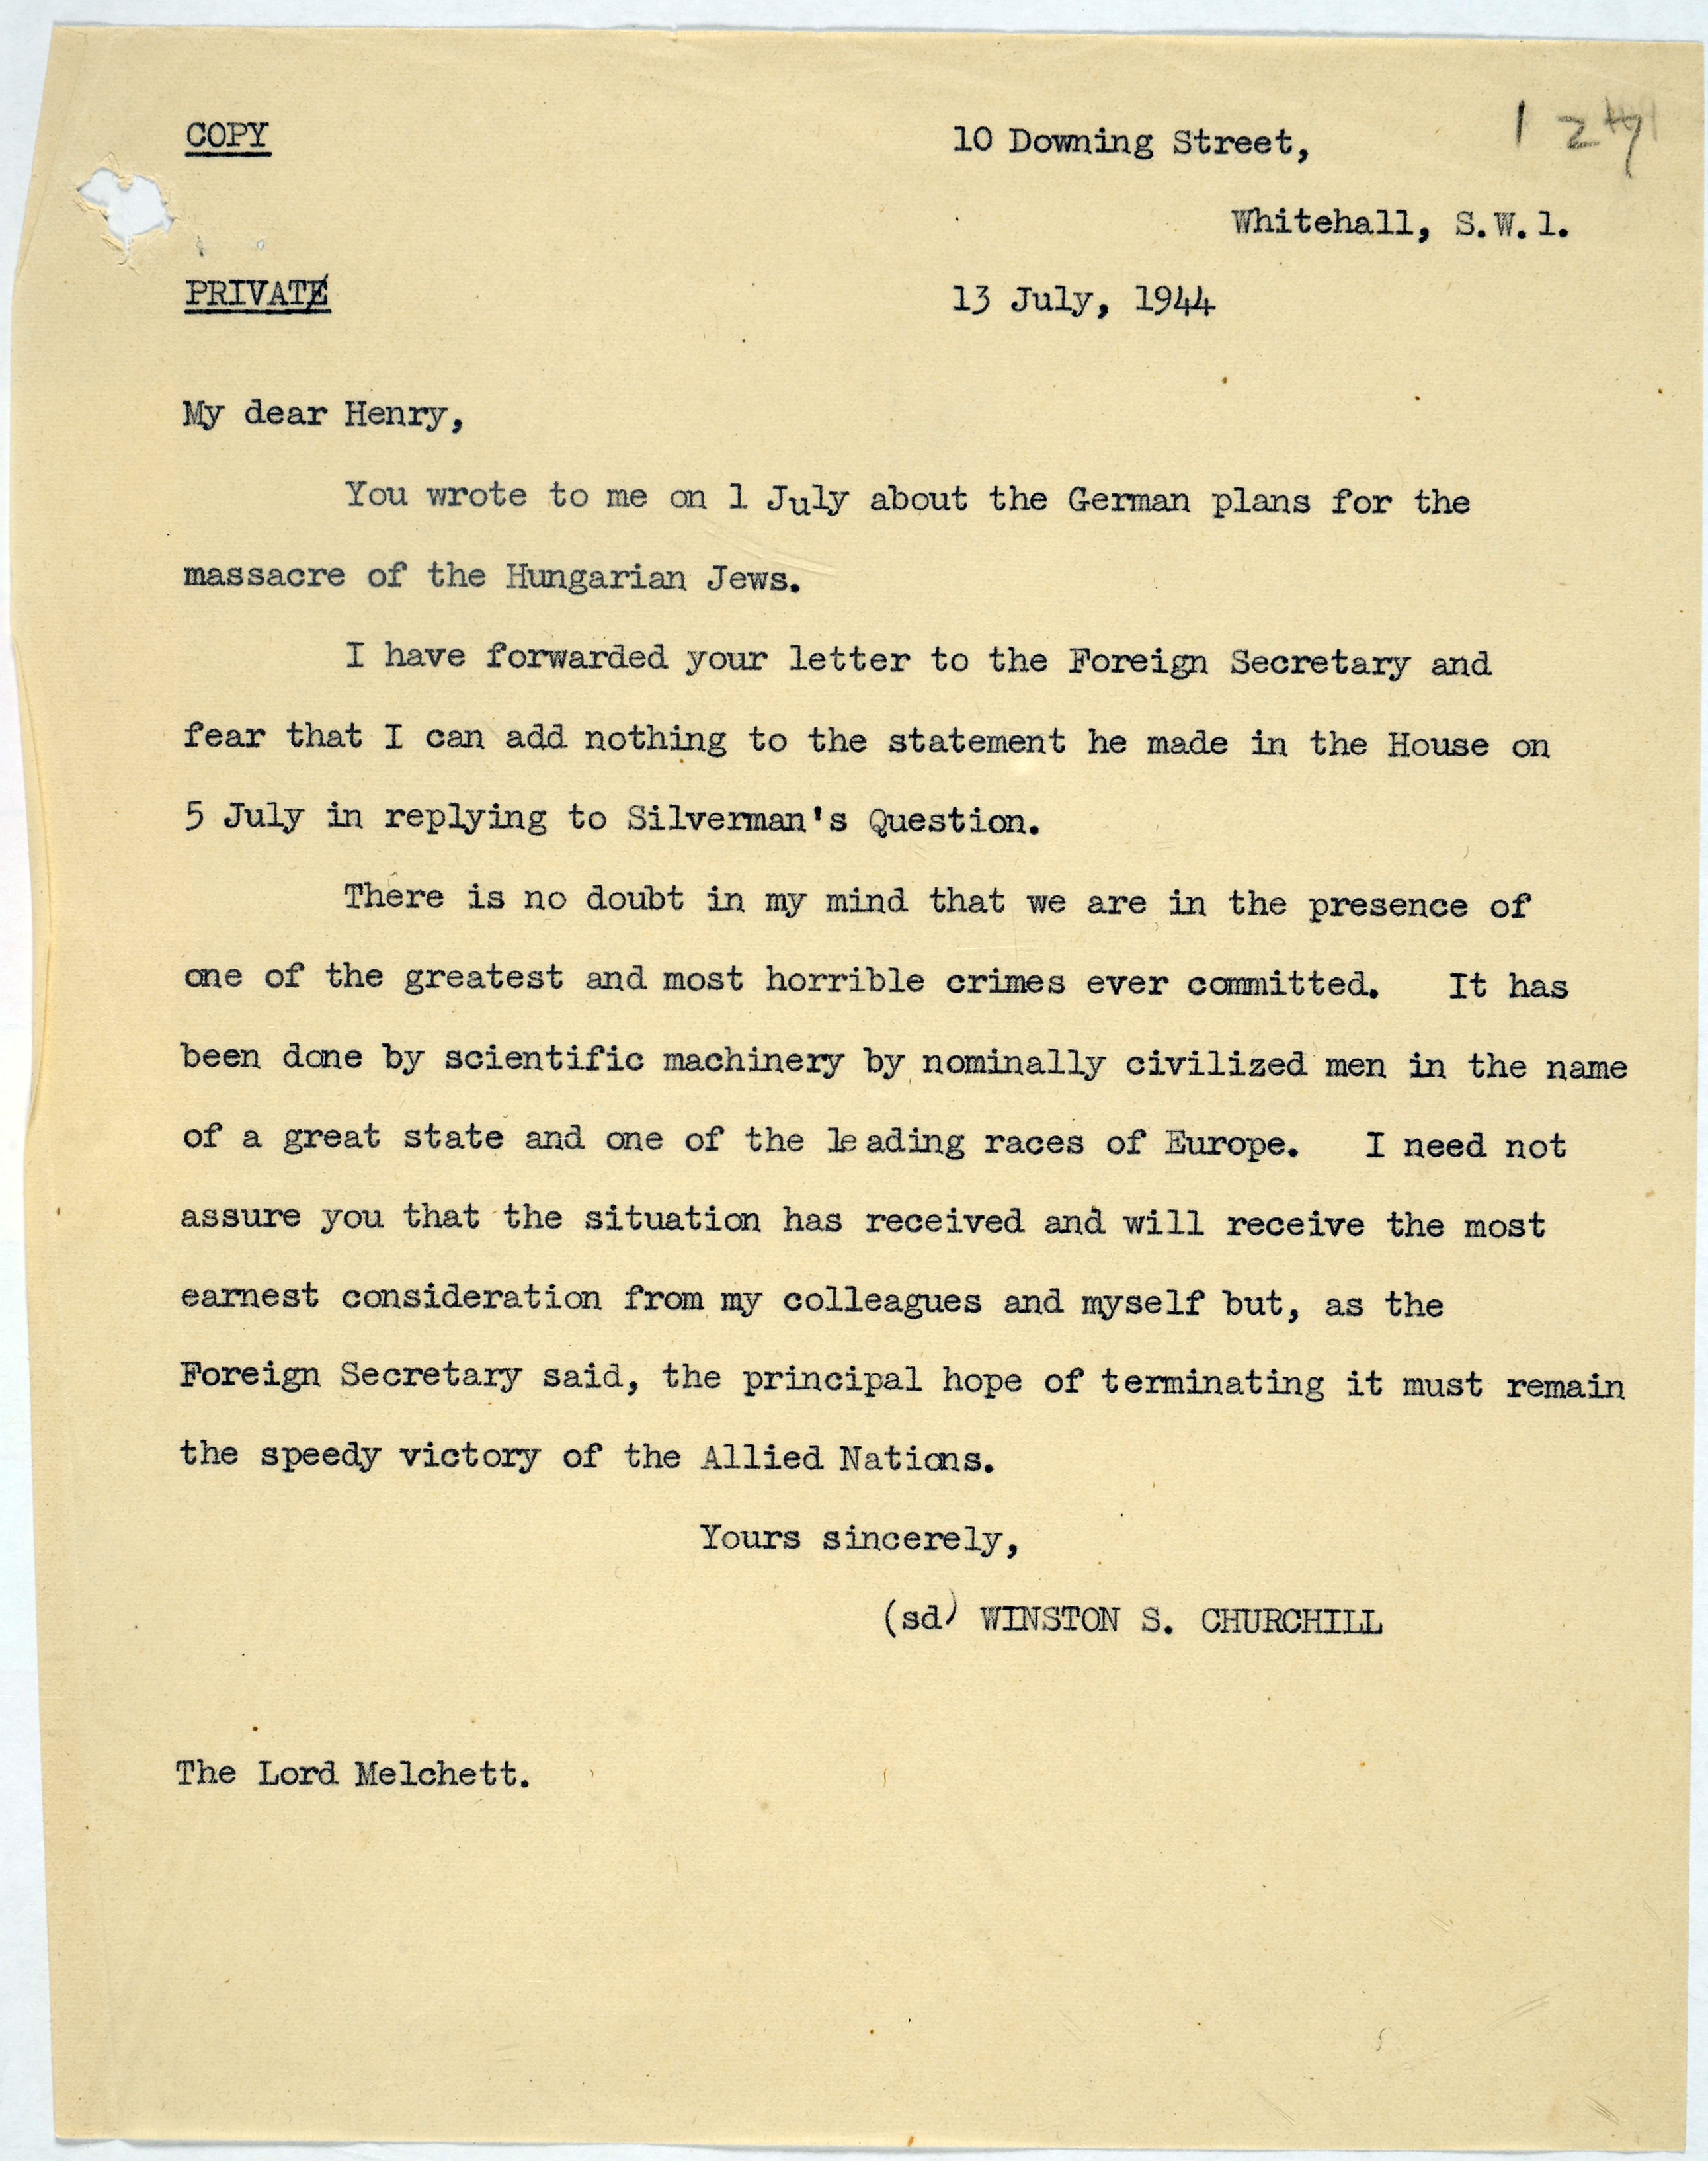 Churchill on massacre of Hungarian Jews